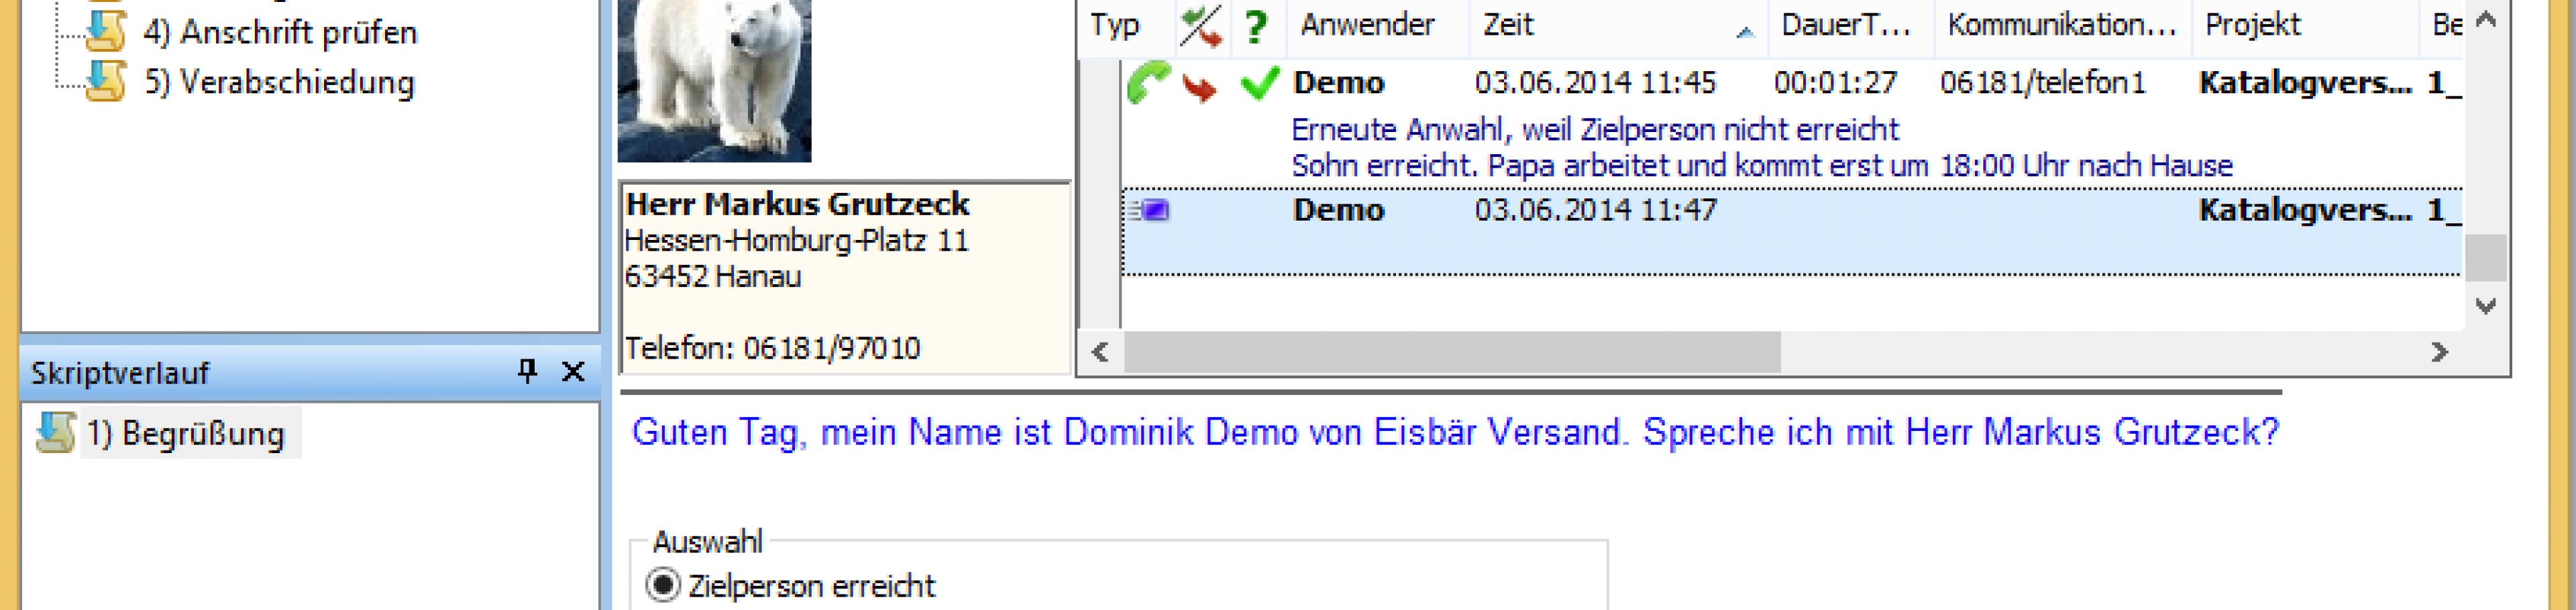 Interaktiver Gesprächsleitfaden in Callcenter Software AG-VIP SQL